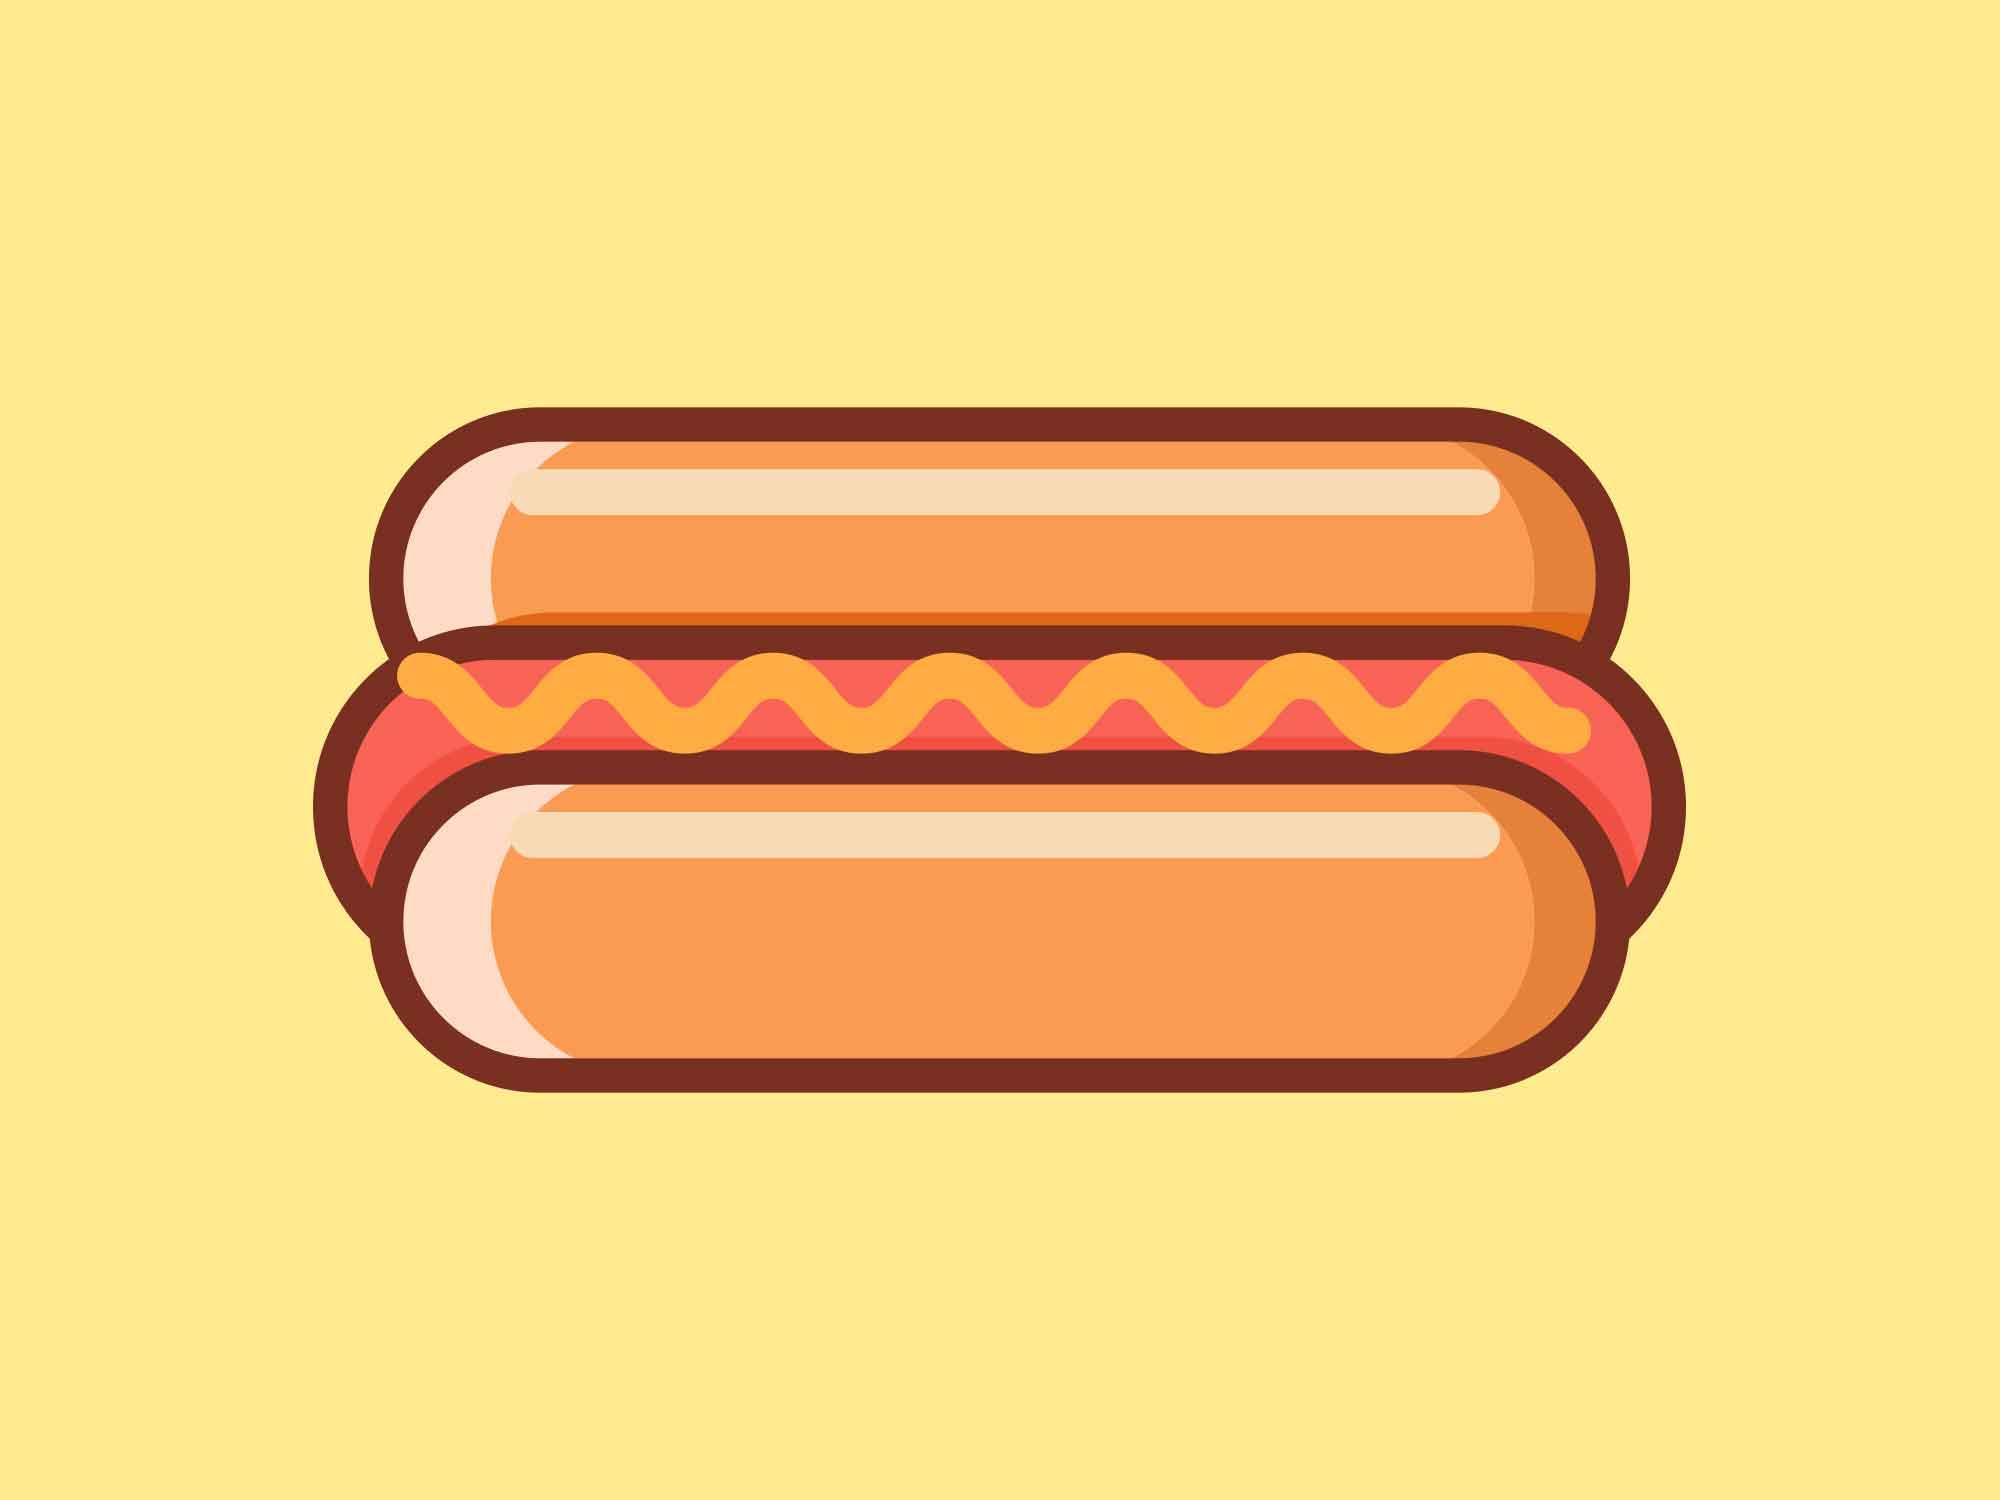 Fast Food Icons Hotdog